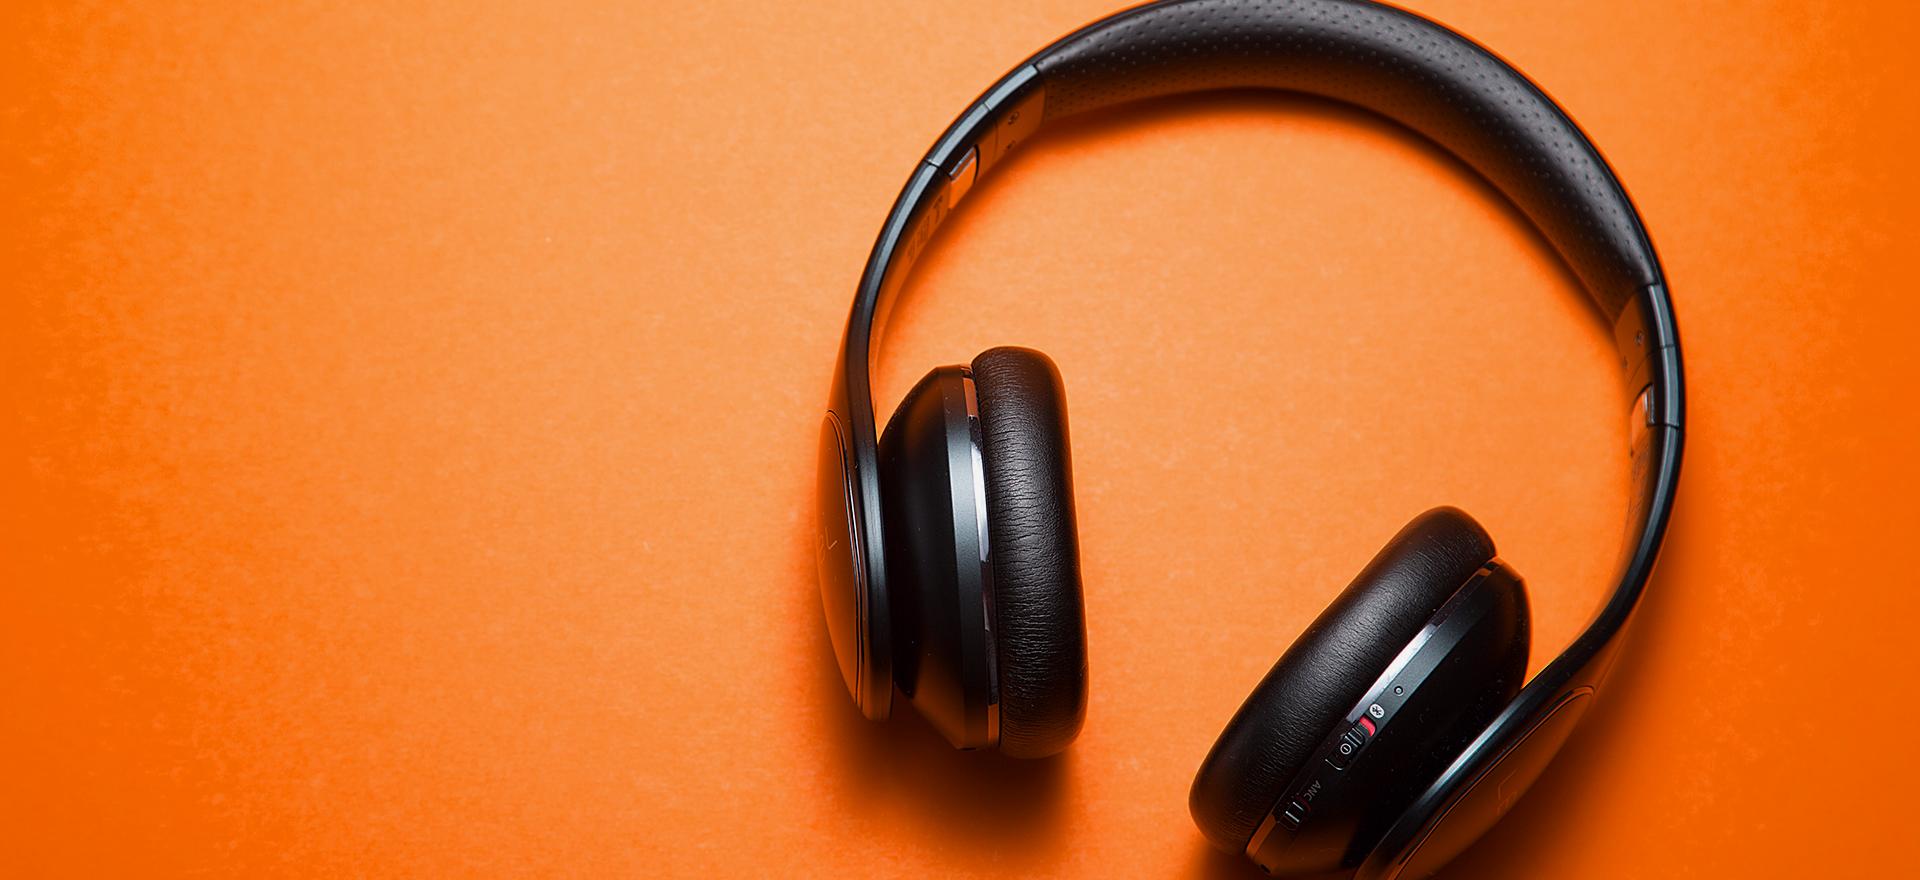 Black headphones on an orange background